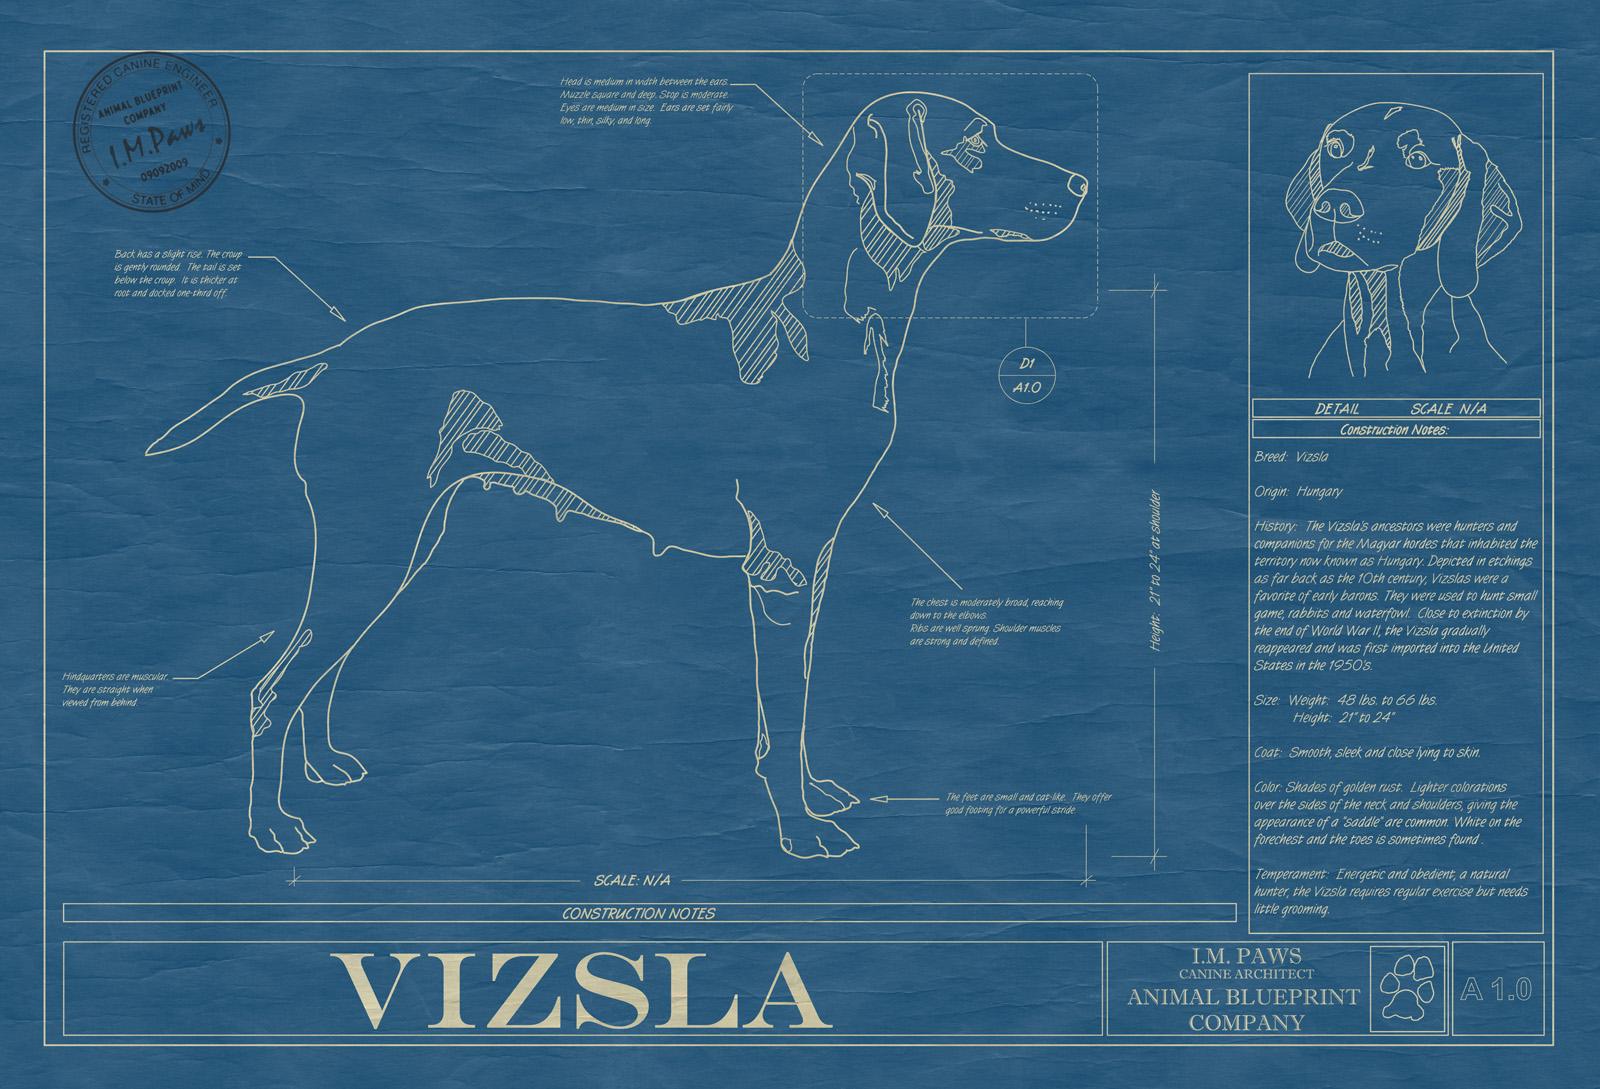 Vizsla animal blueprint company vizsla dog blueprint malvernweather Image collections